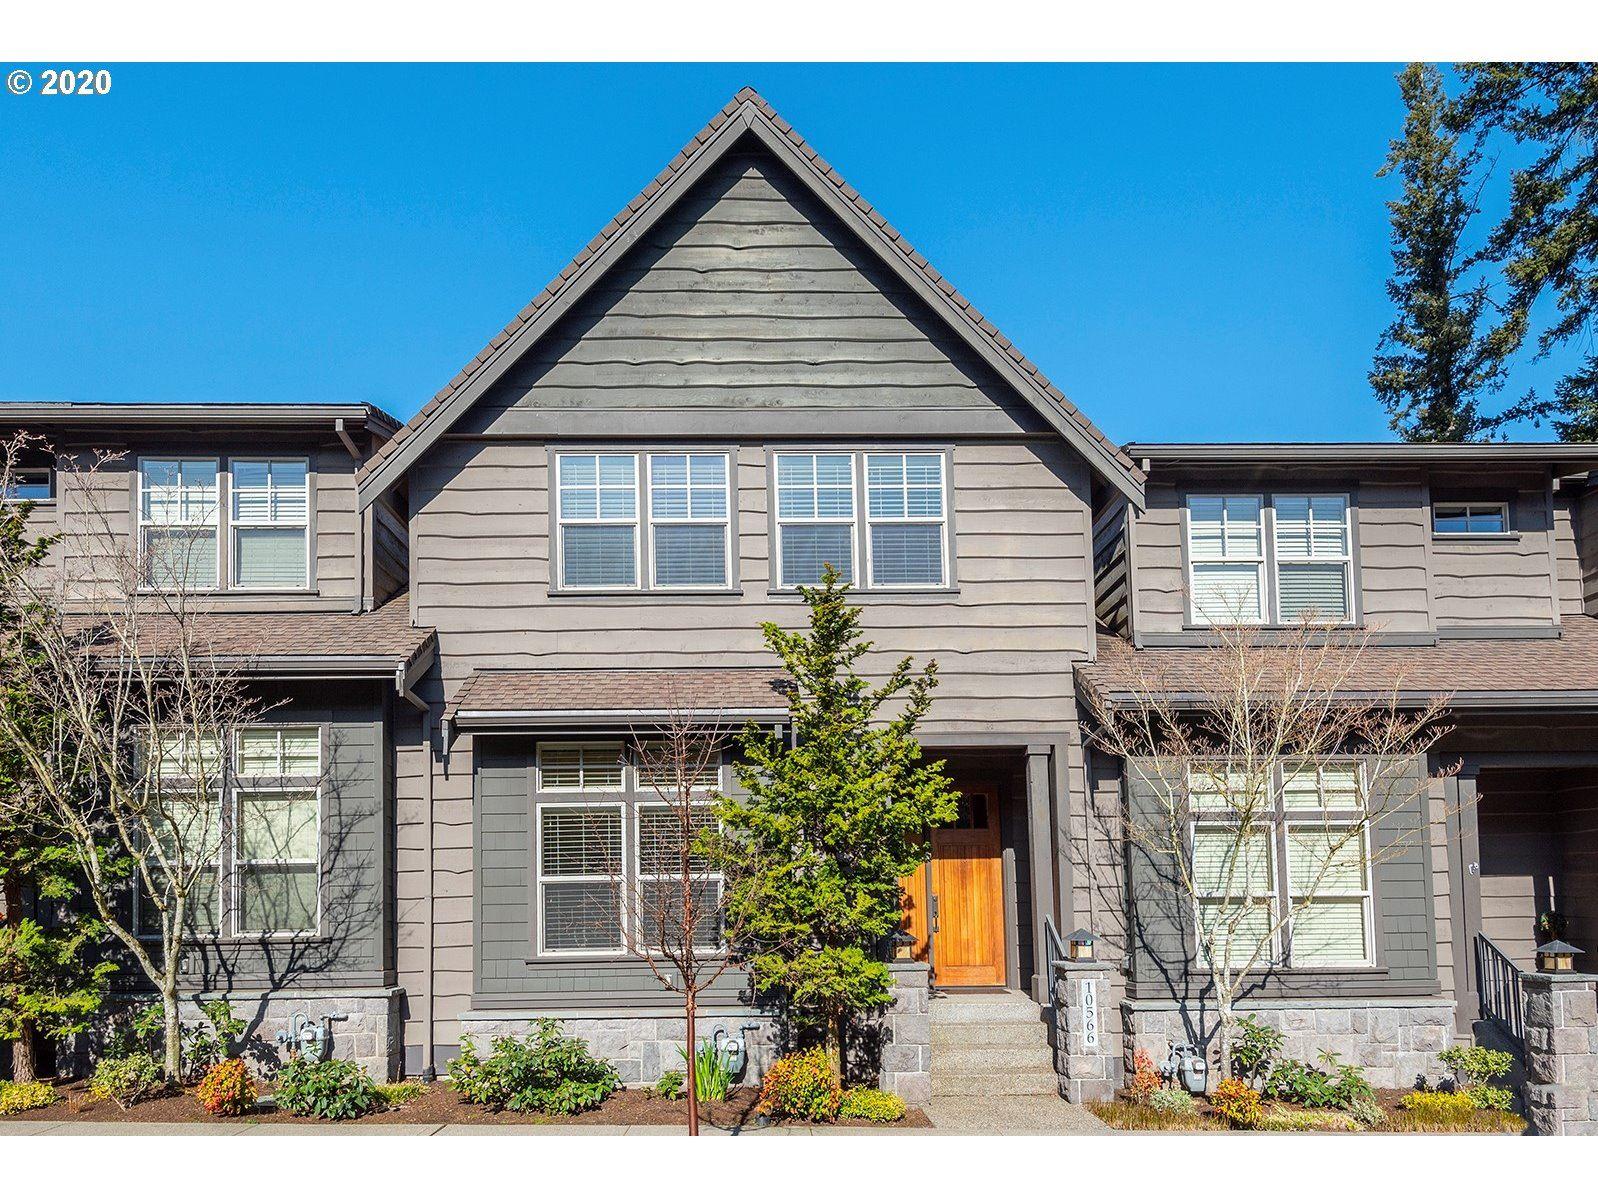 10566 SW WINDWOOD WAY, Portland, OR 97225 - MLS#: 20504211